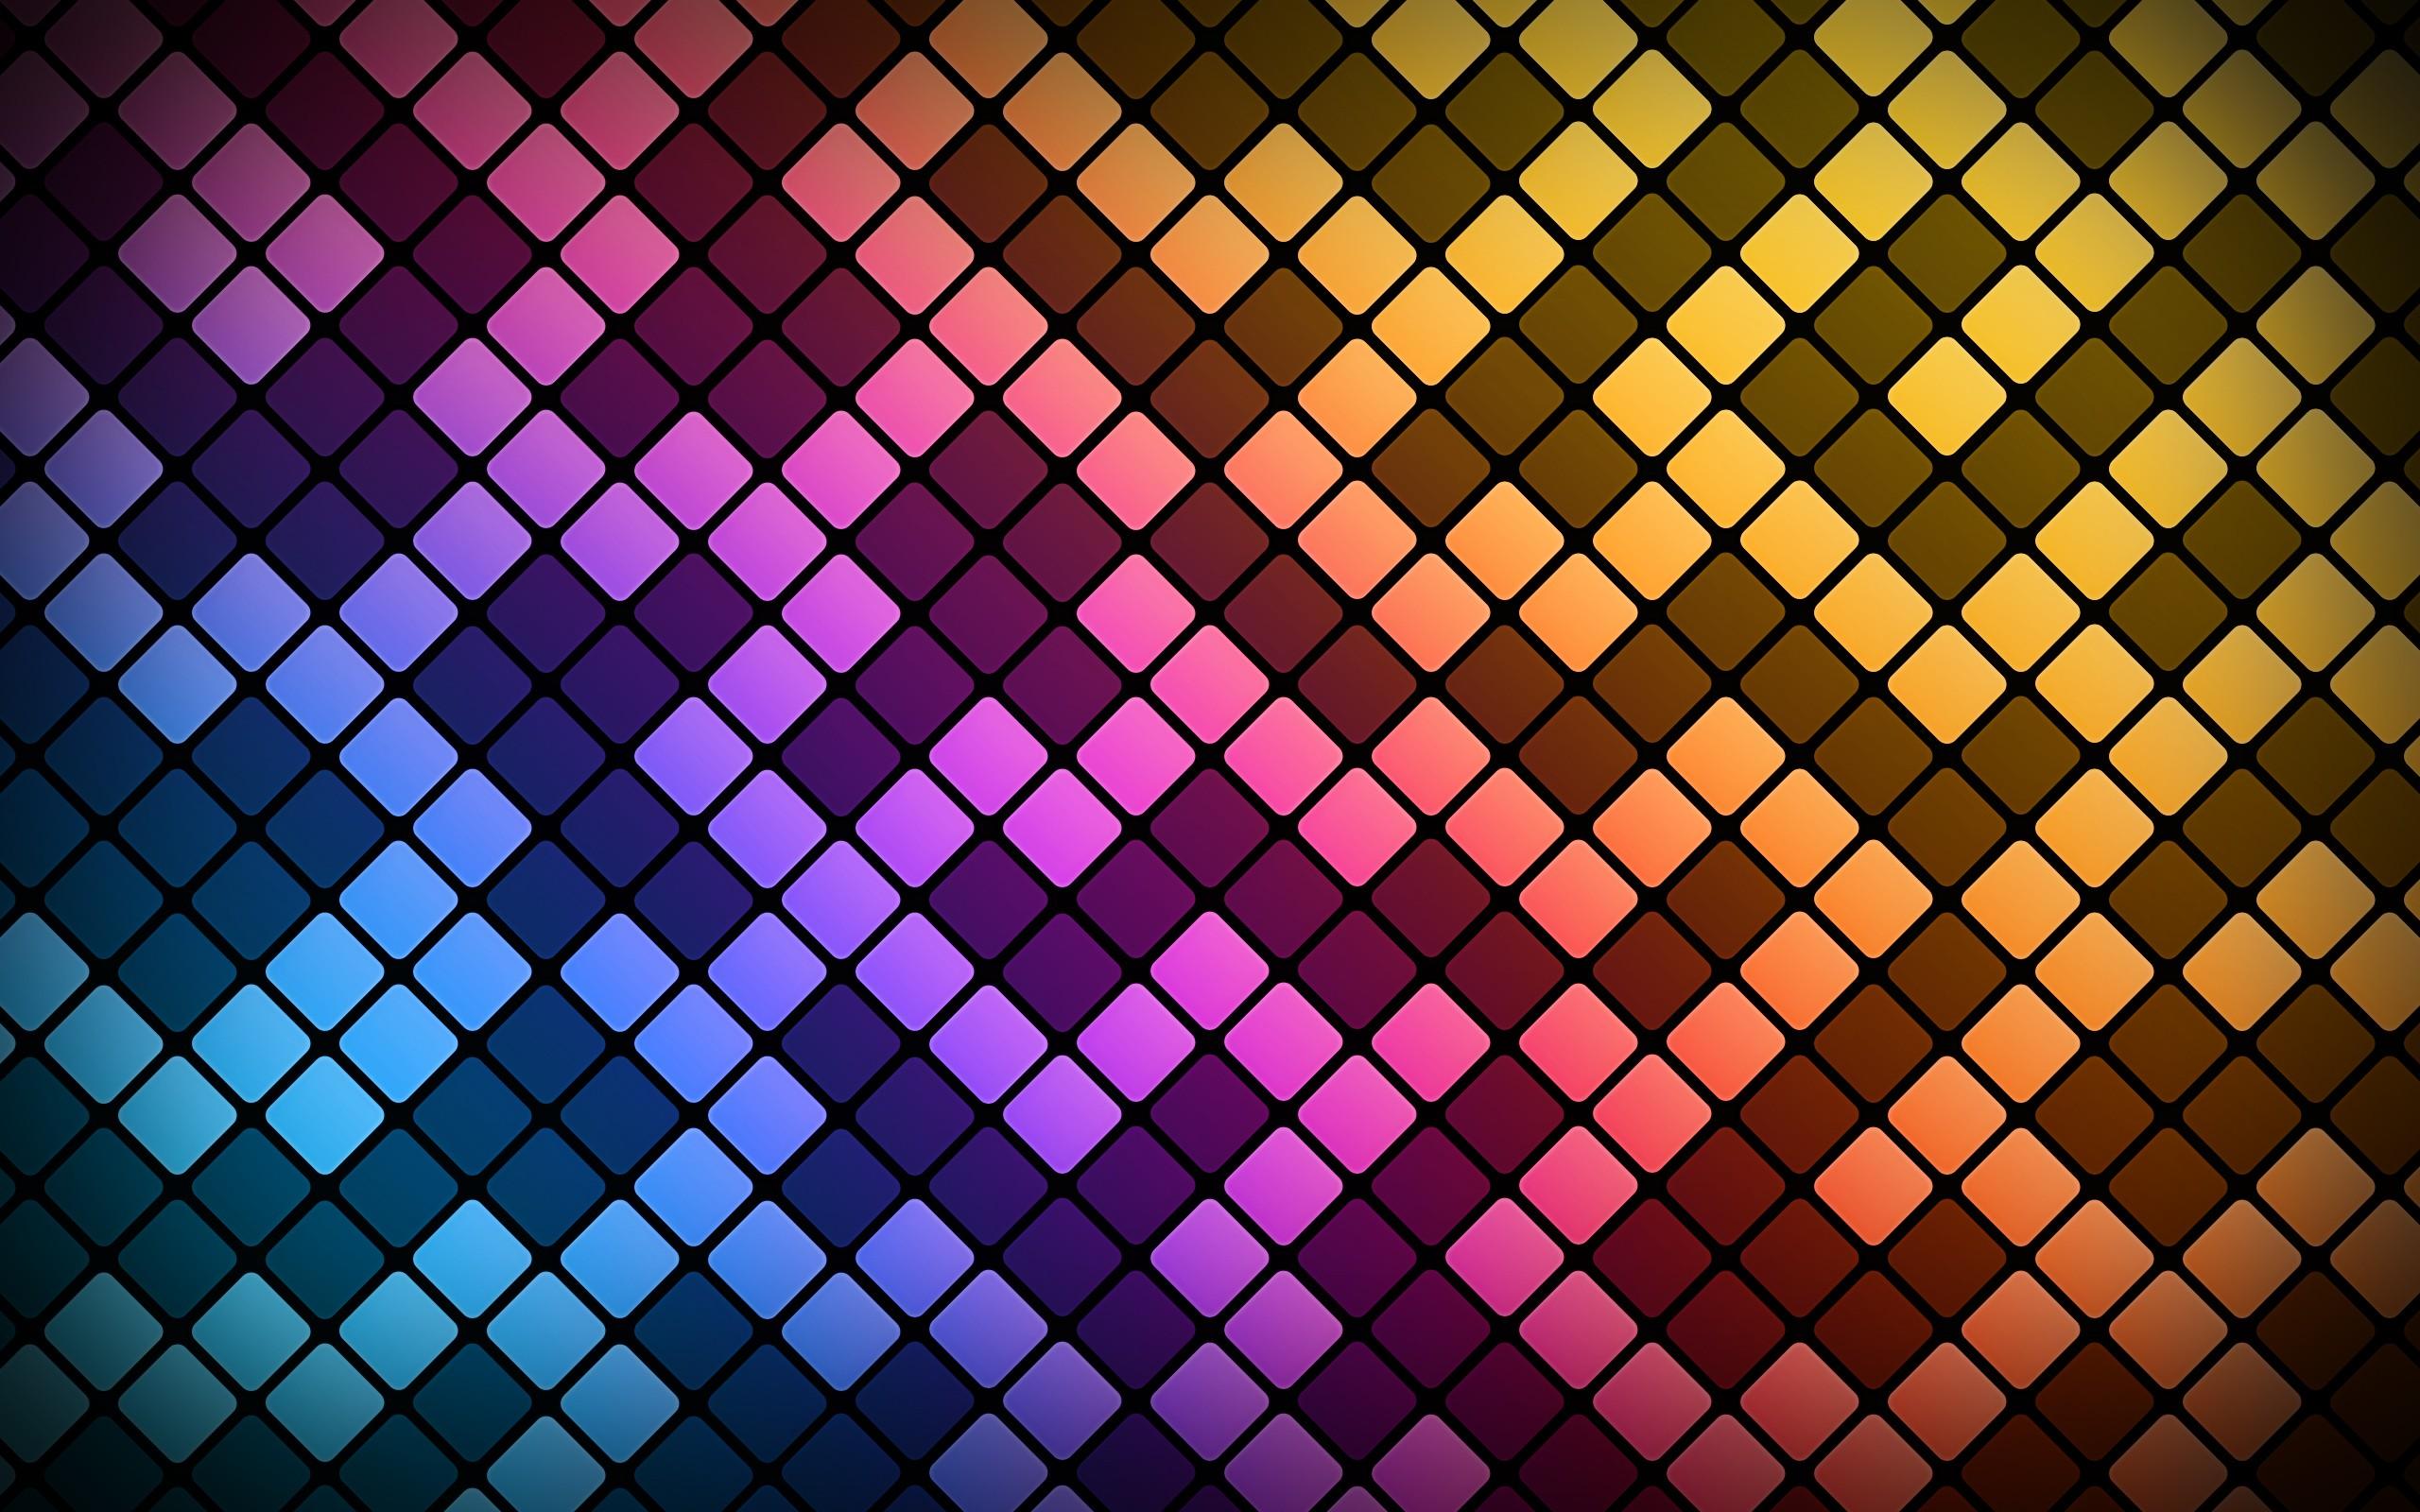 tetris pattern wallpaper 2560x1600 1939 wallpaperup